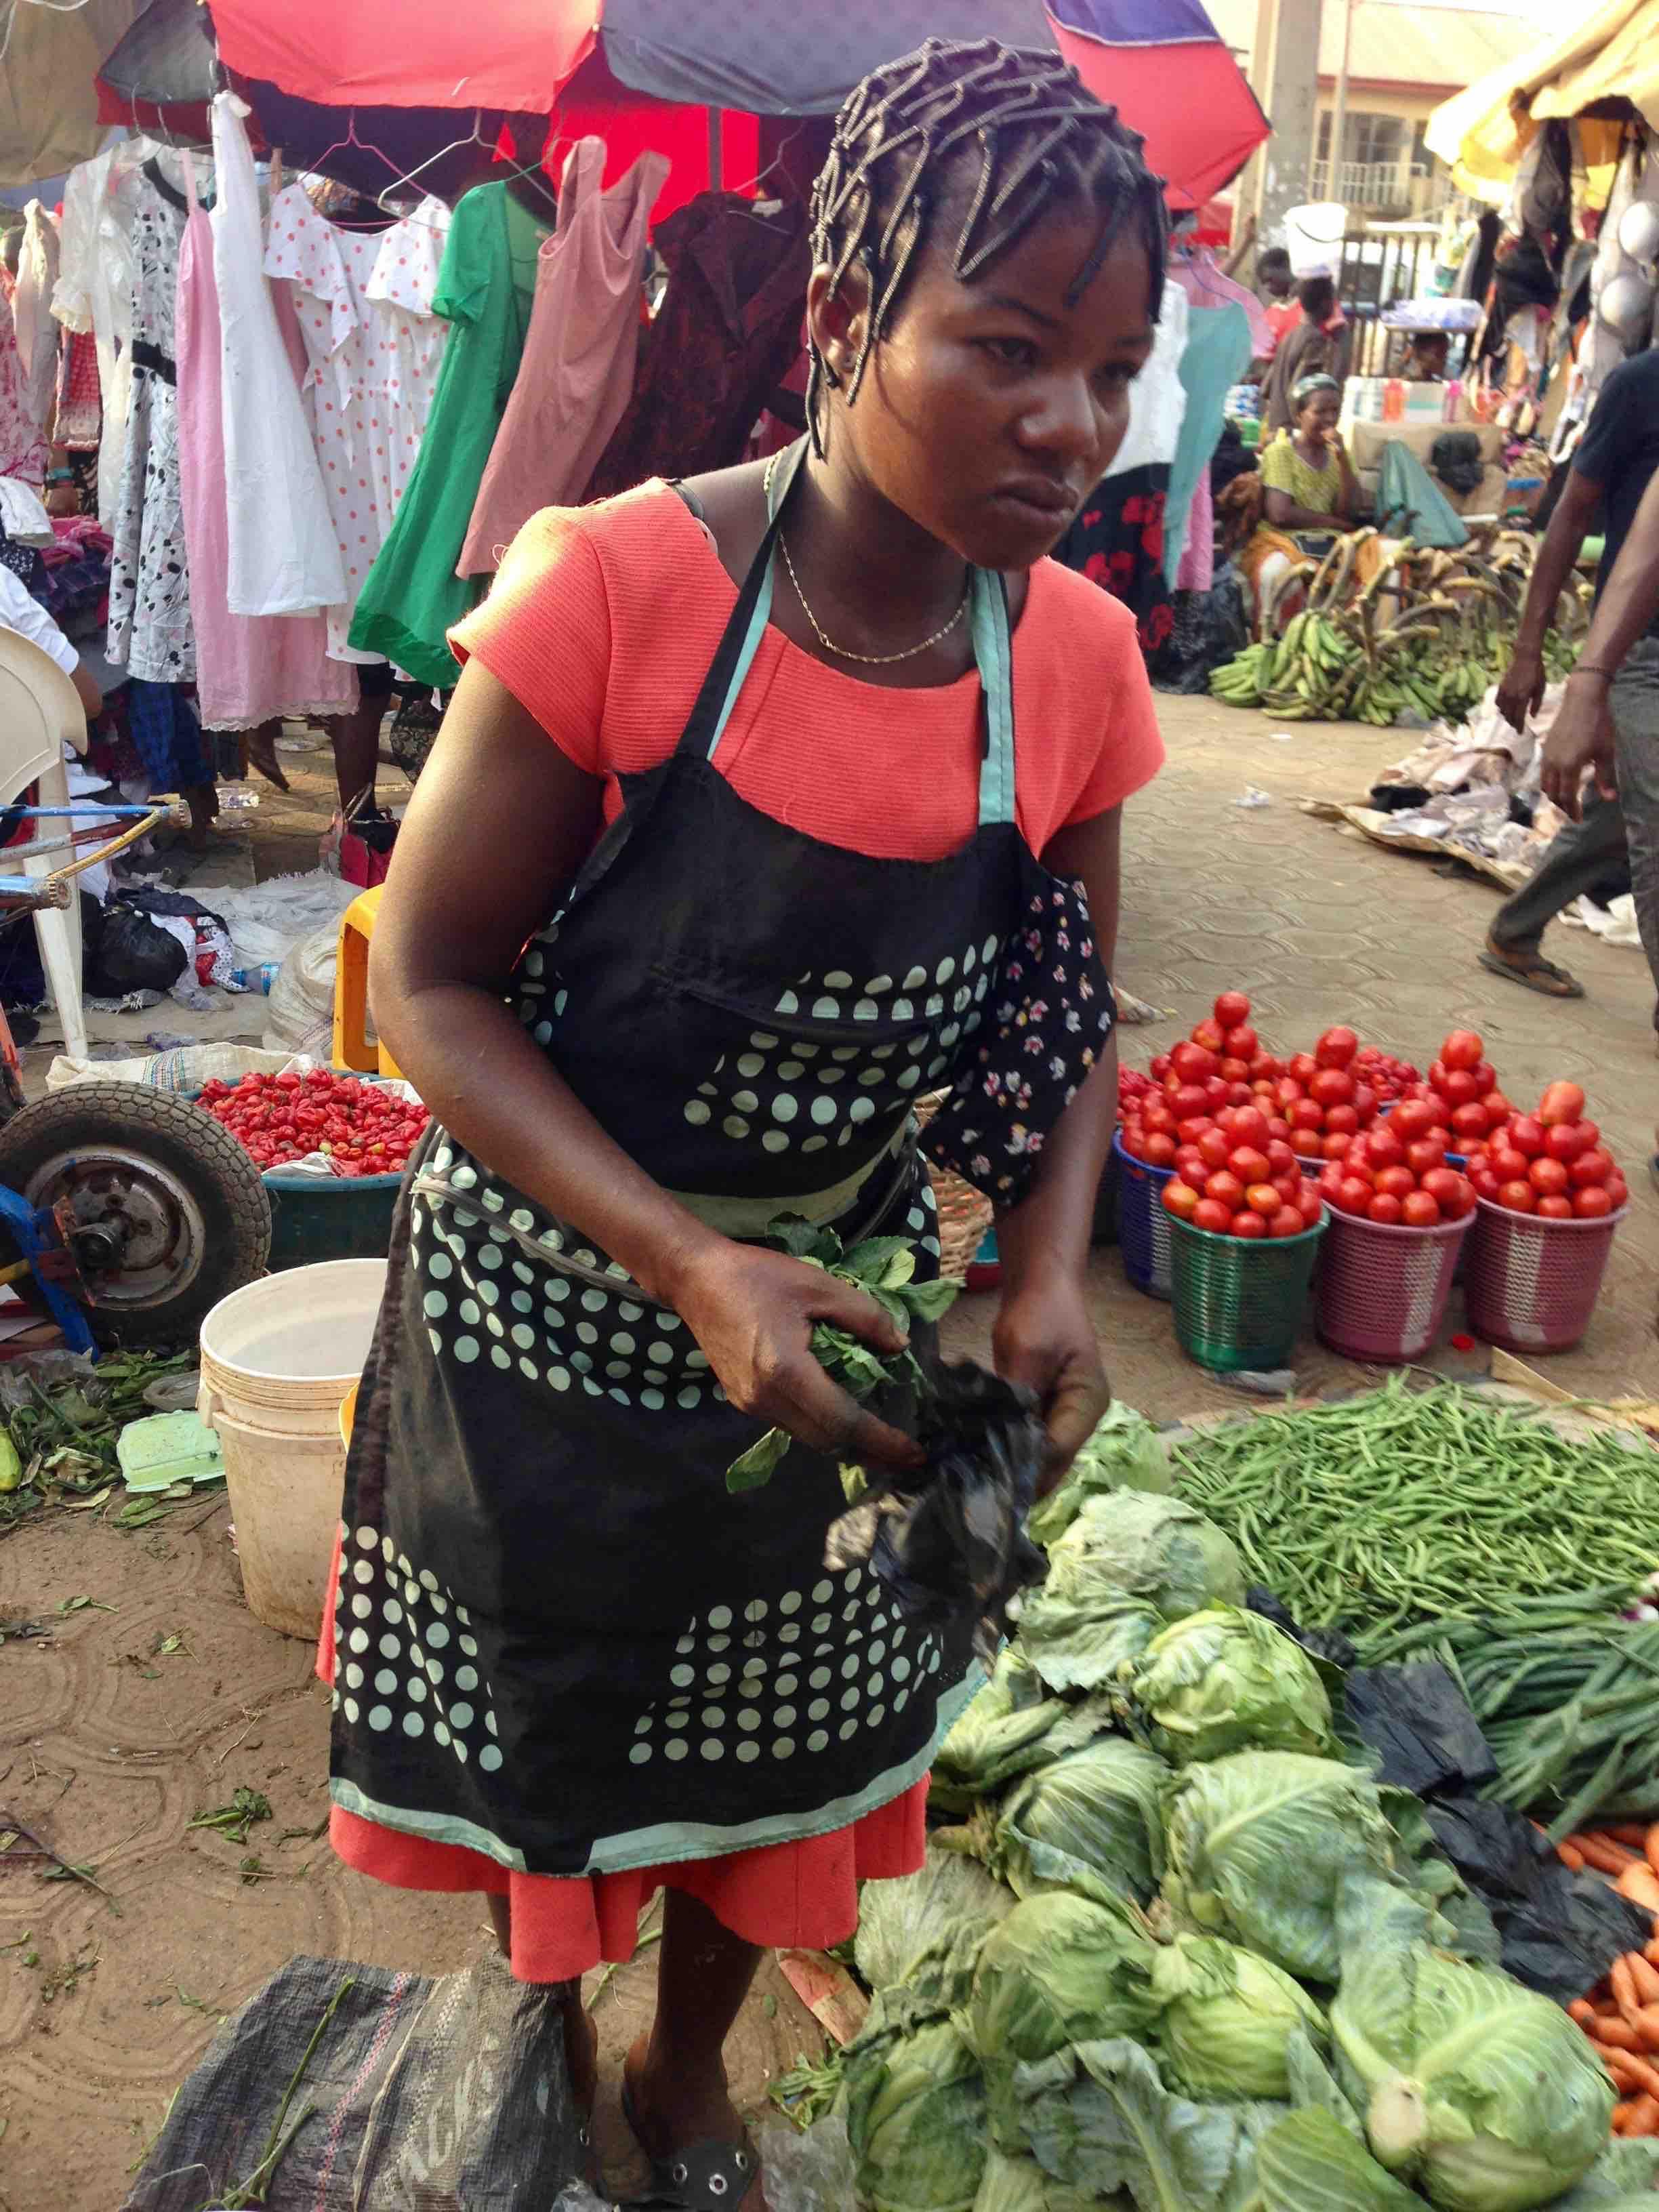 Igbo Woman selling produce in Dutse Market, Dutse, Abuja, Nigeria. #JujuFilms